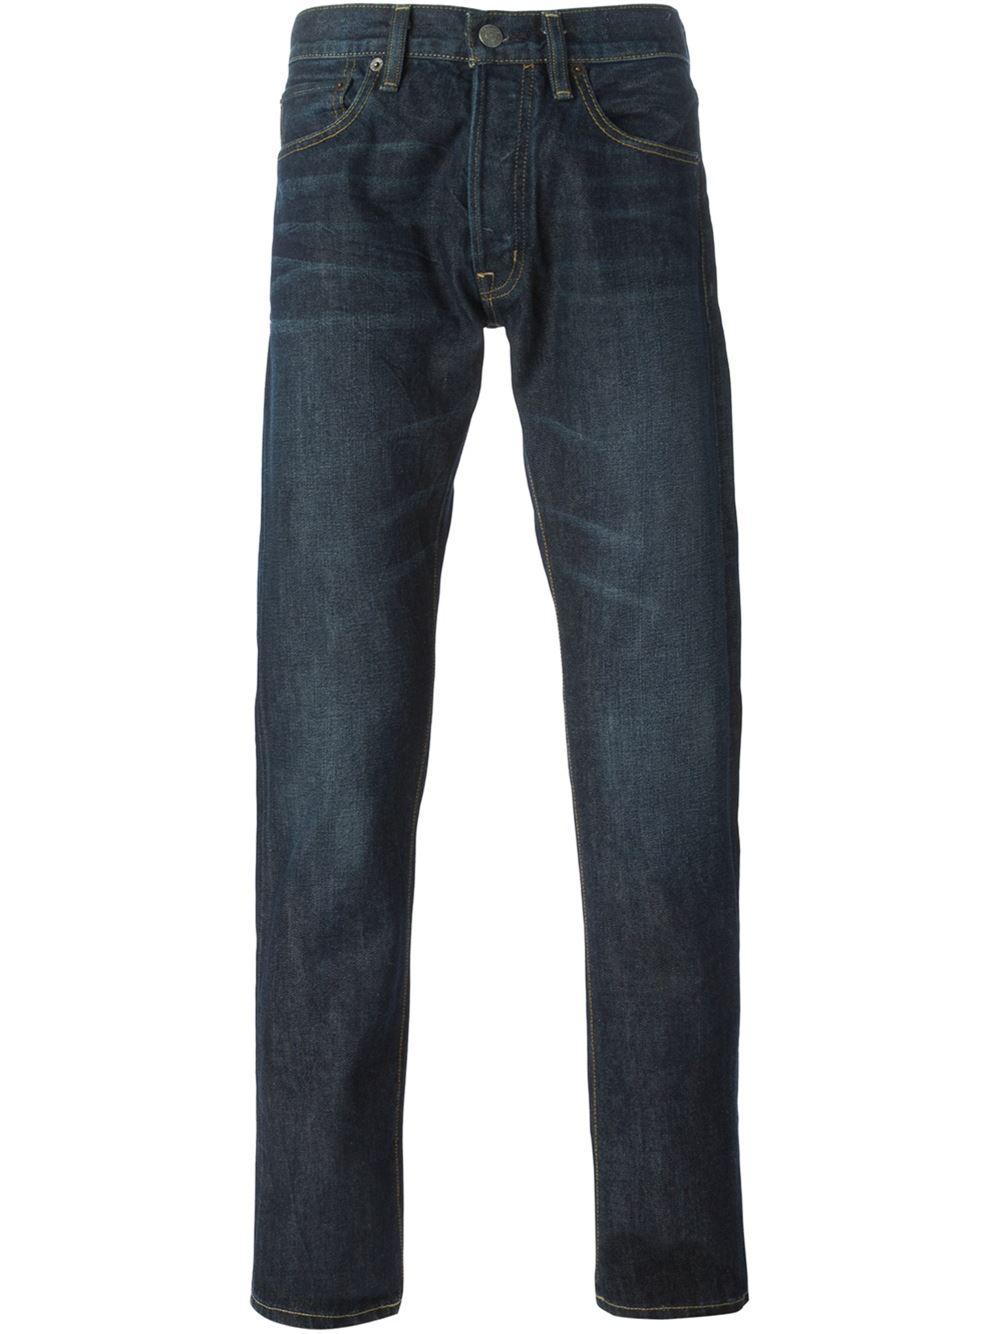 denim supply ralph lauren straight leg jeans in blue for. Black Bedroom Furniture Sets. Home Design Ideas